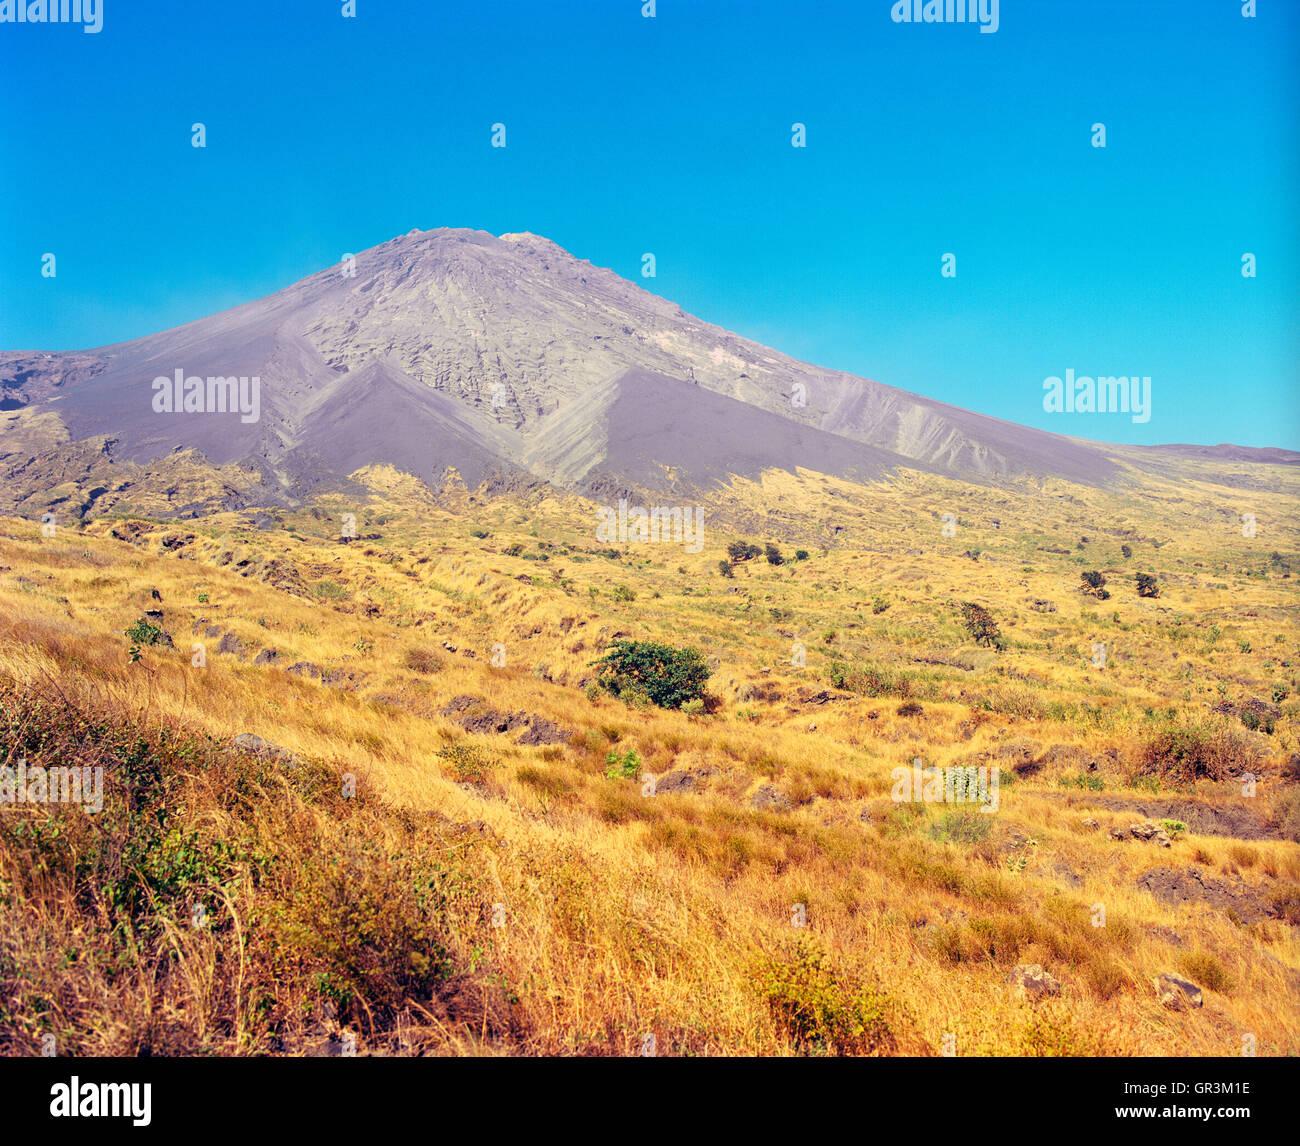 Pico de Fogo. Fogo, Islas de Cabo Verde, África. Imagen De Stock